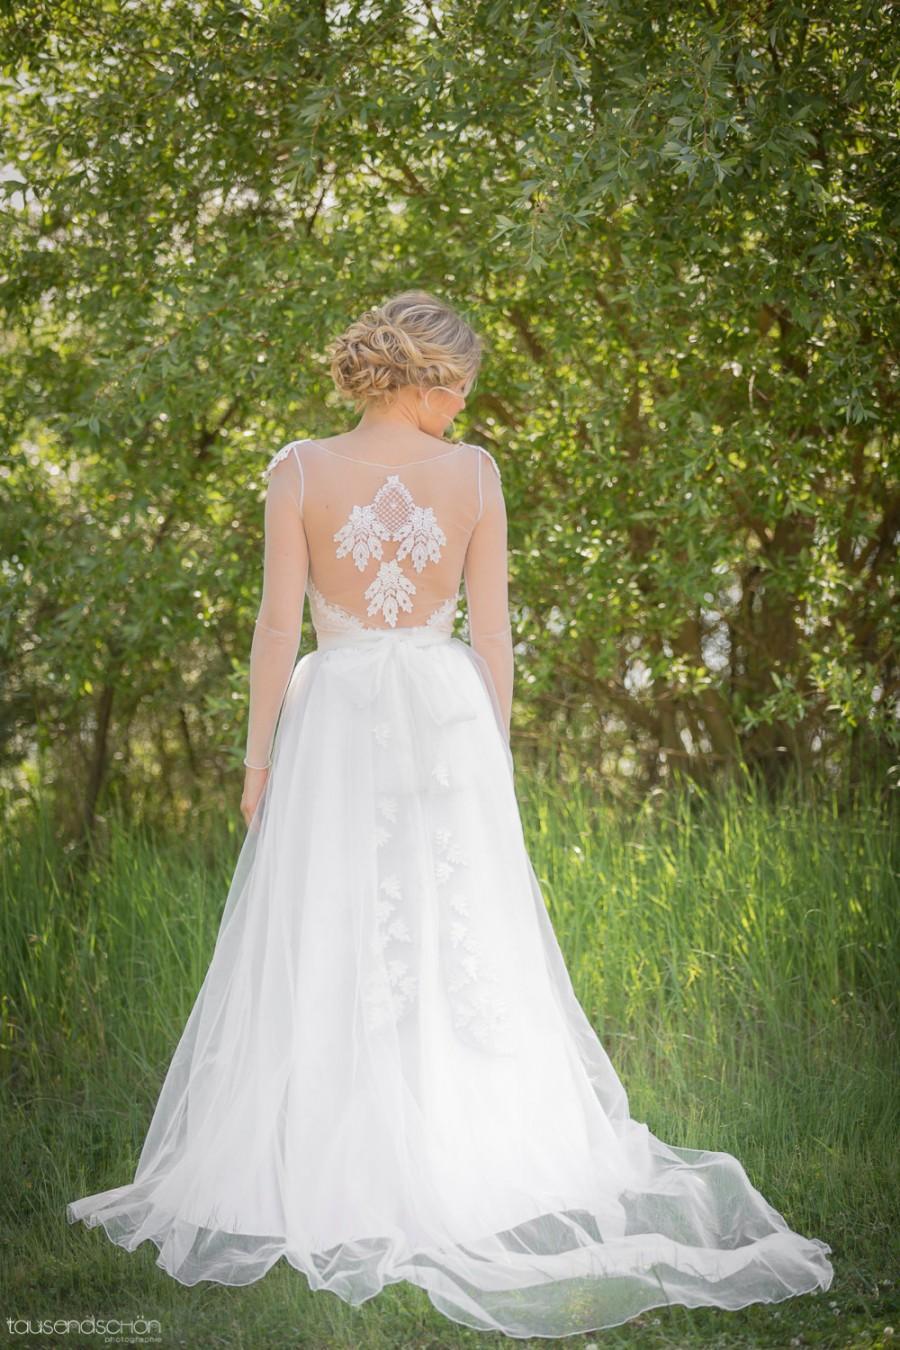 Noemi Unique Wedding Dress Boho Vintage Inspired Sleeved Dress Lace